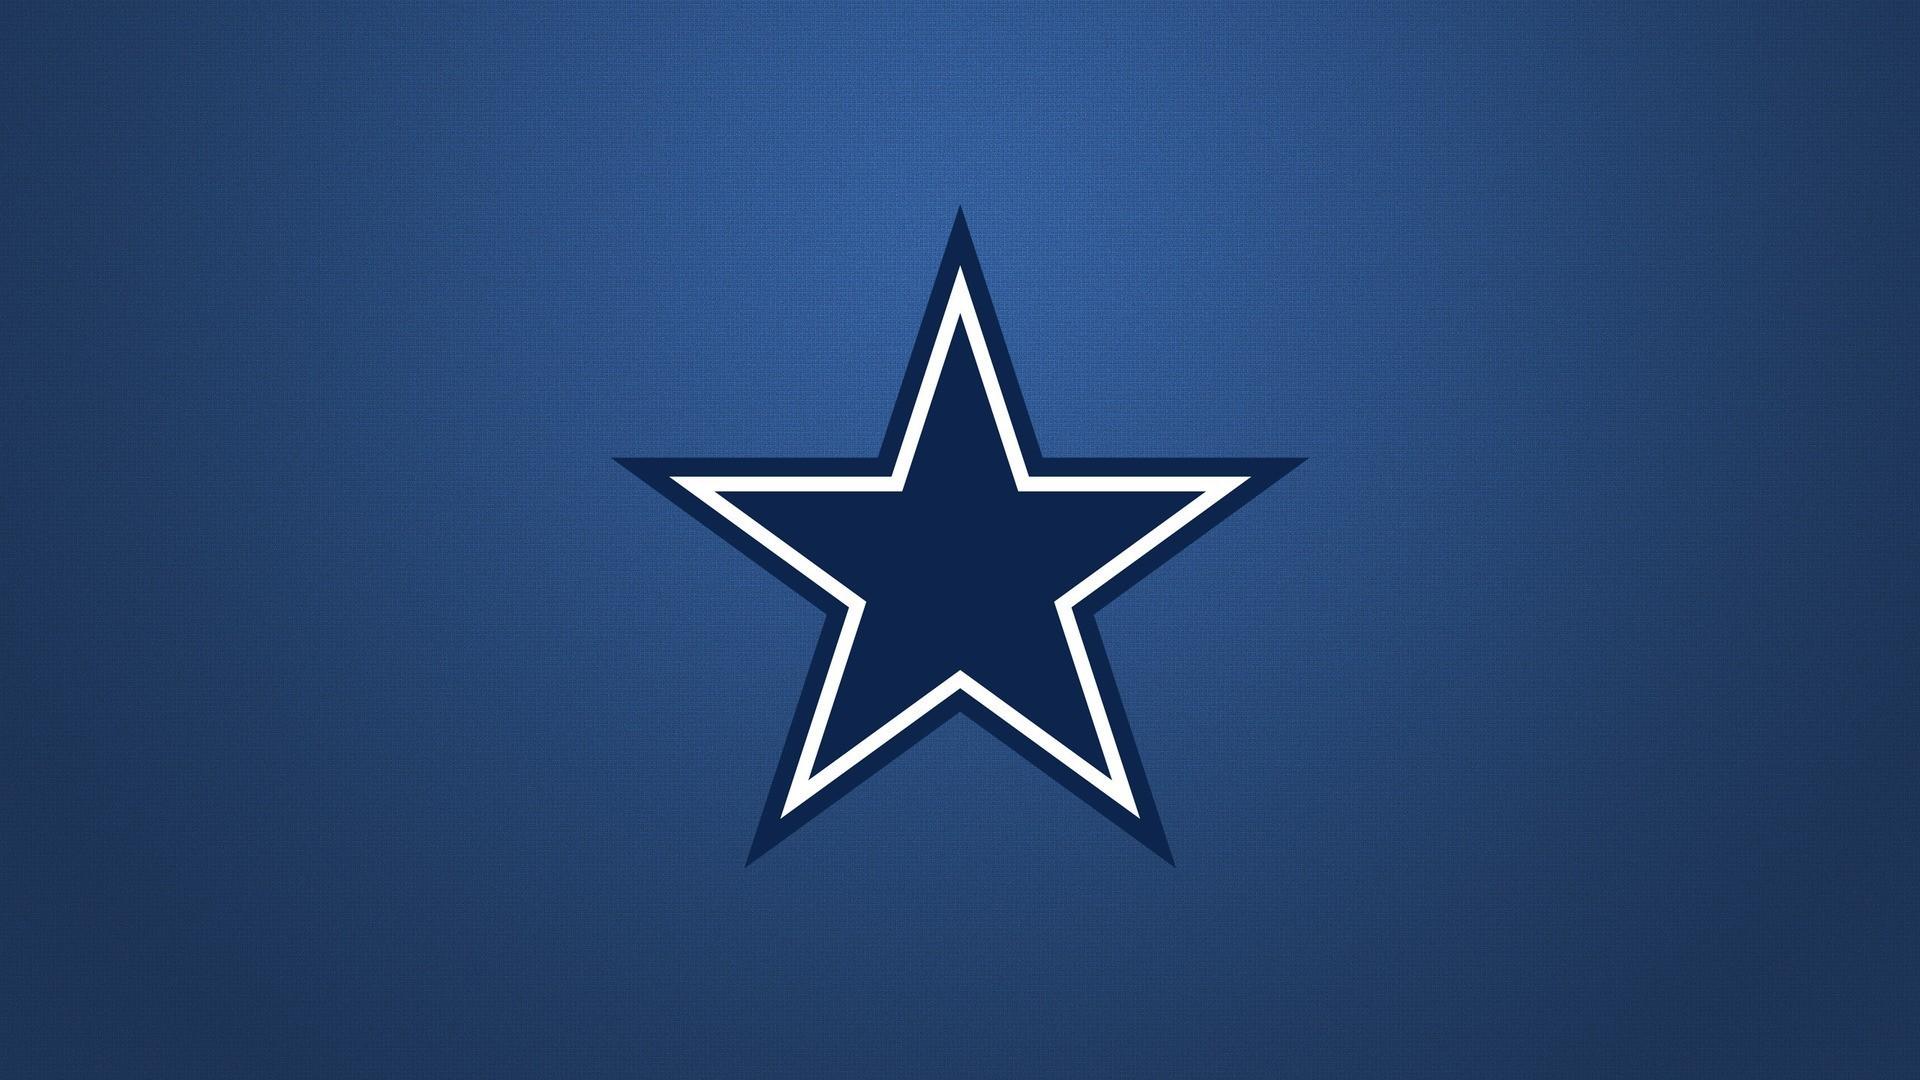 Dallas Cowboys Logo Hd Wallpaper Sports Nfl Football